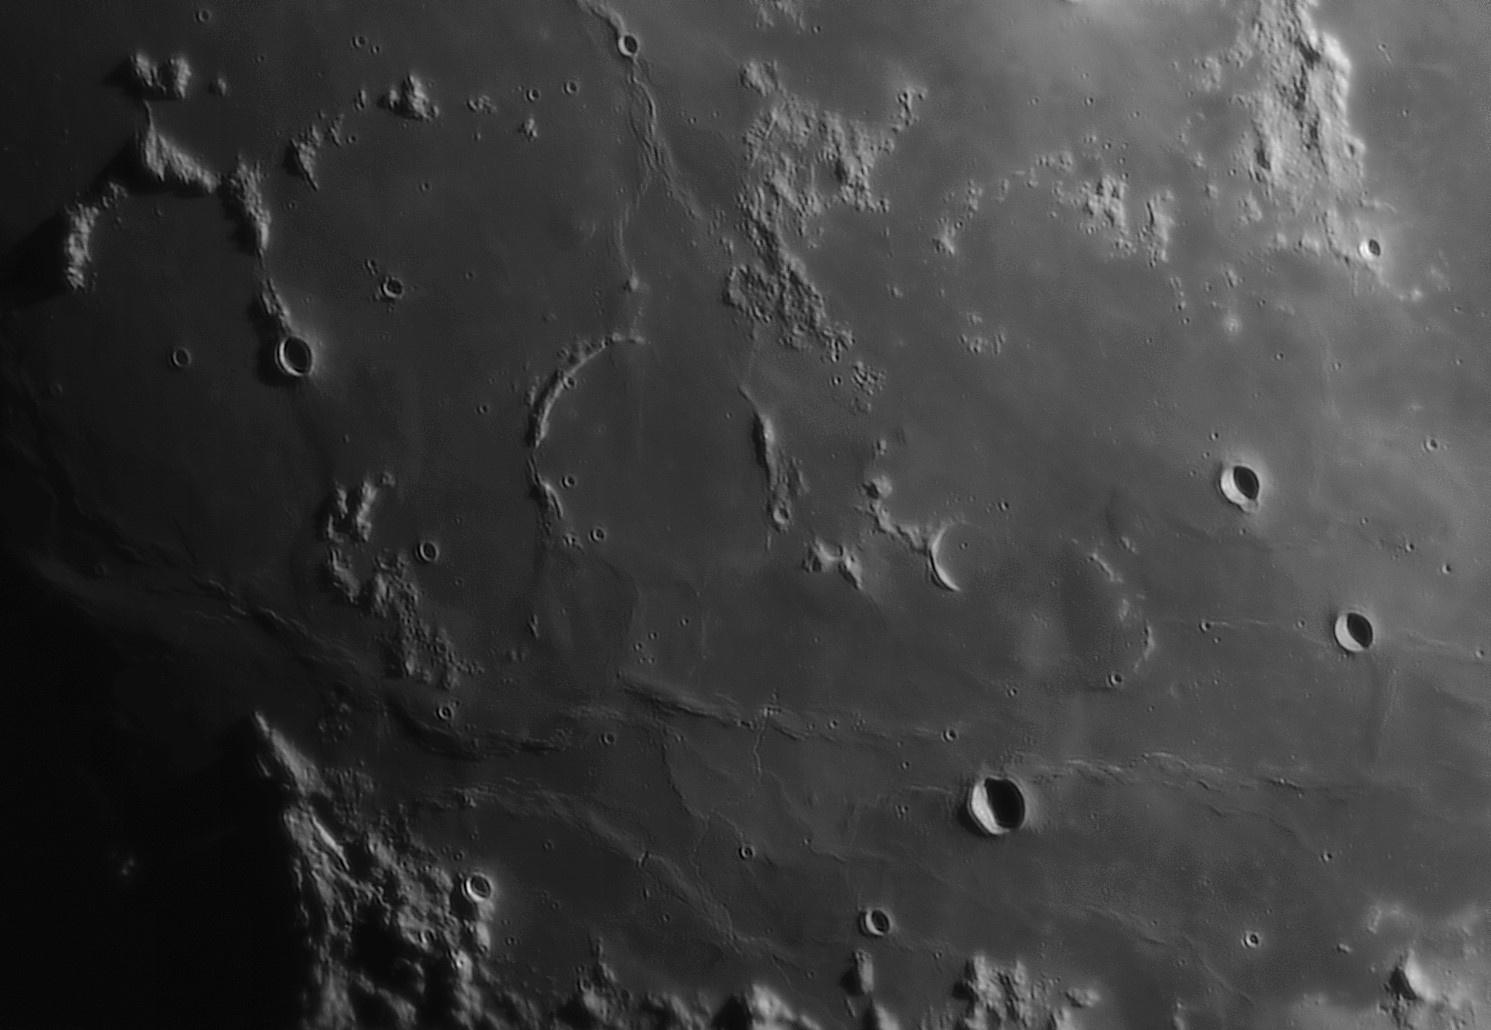 Herigonius Rima 20190415_213528_g3_ap325_conv.jpg